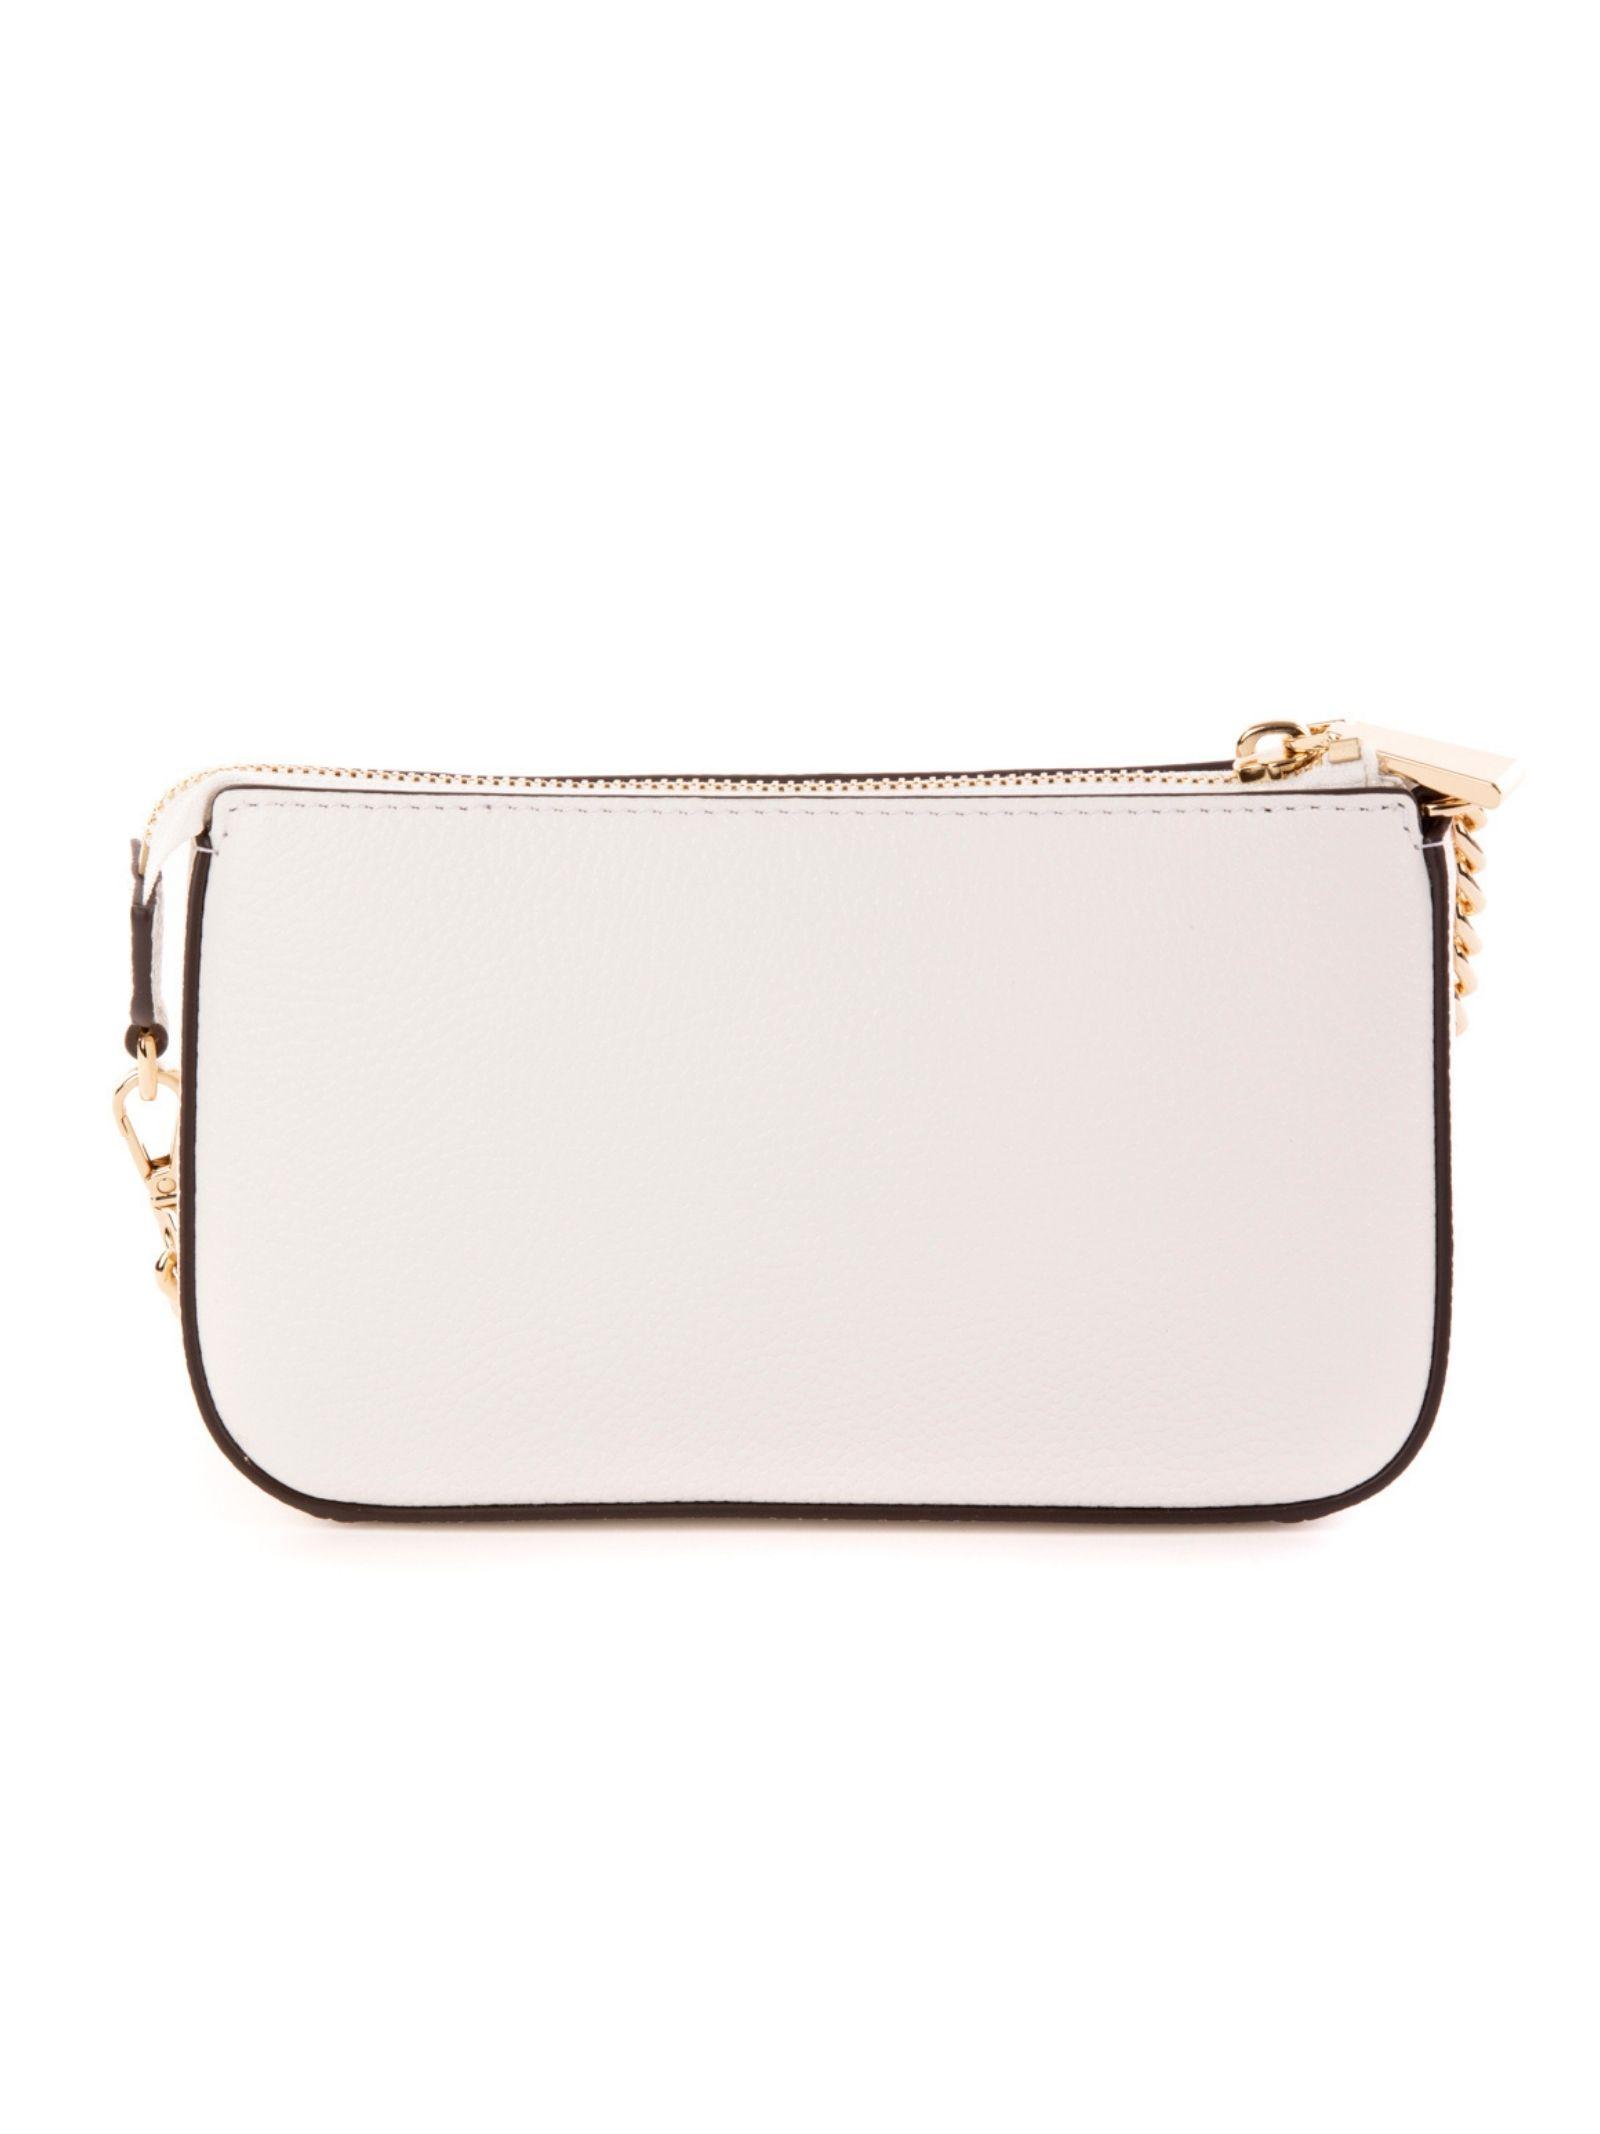 MICHAEL KORS | Handbag | 32F7GFDW6L085